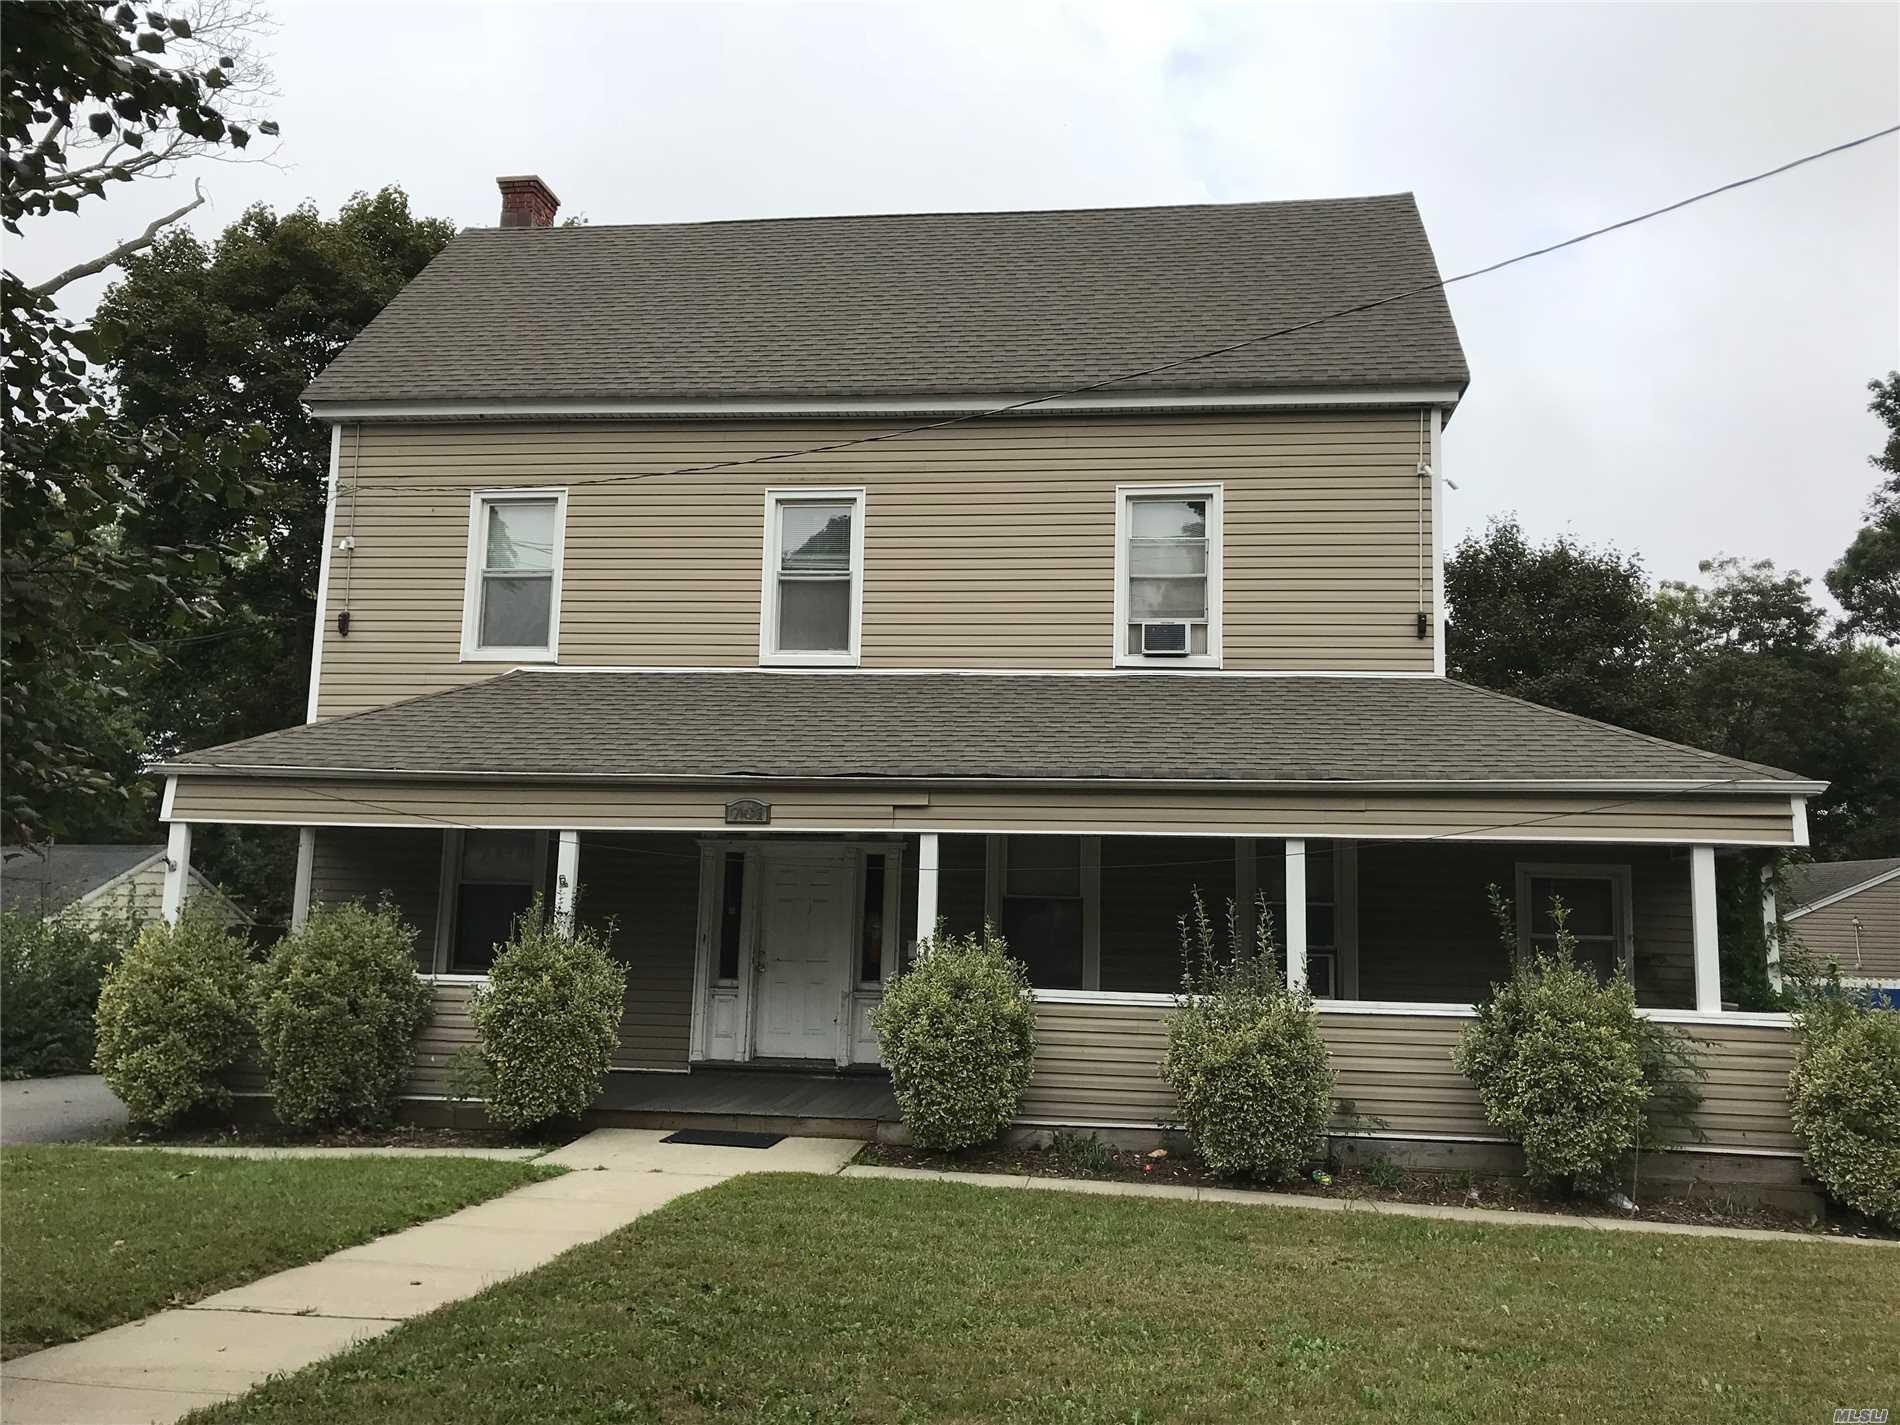 761 Woodfield Rd - W. Hempstead, New York